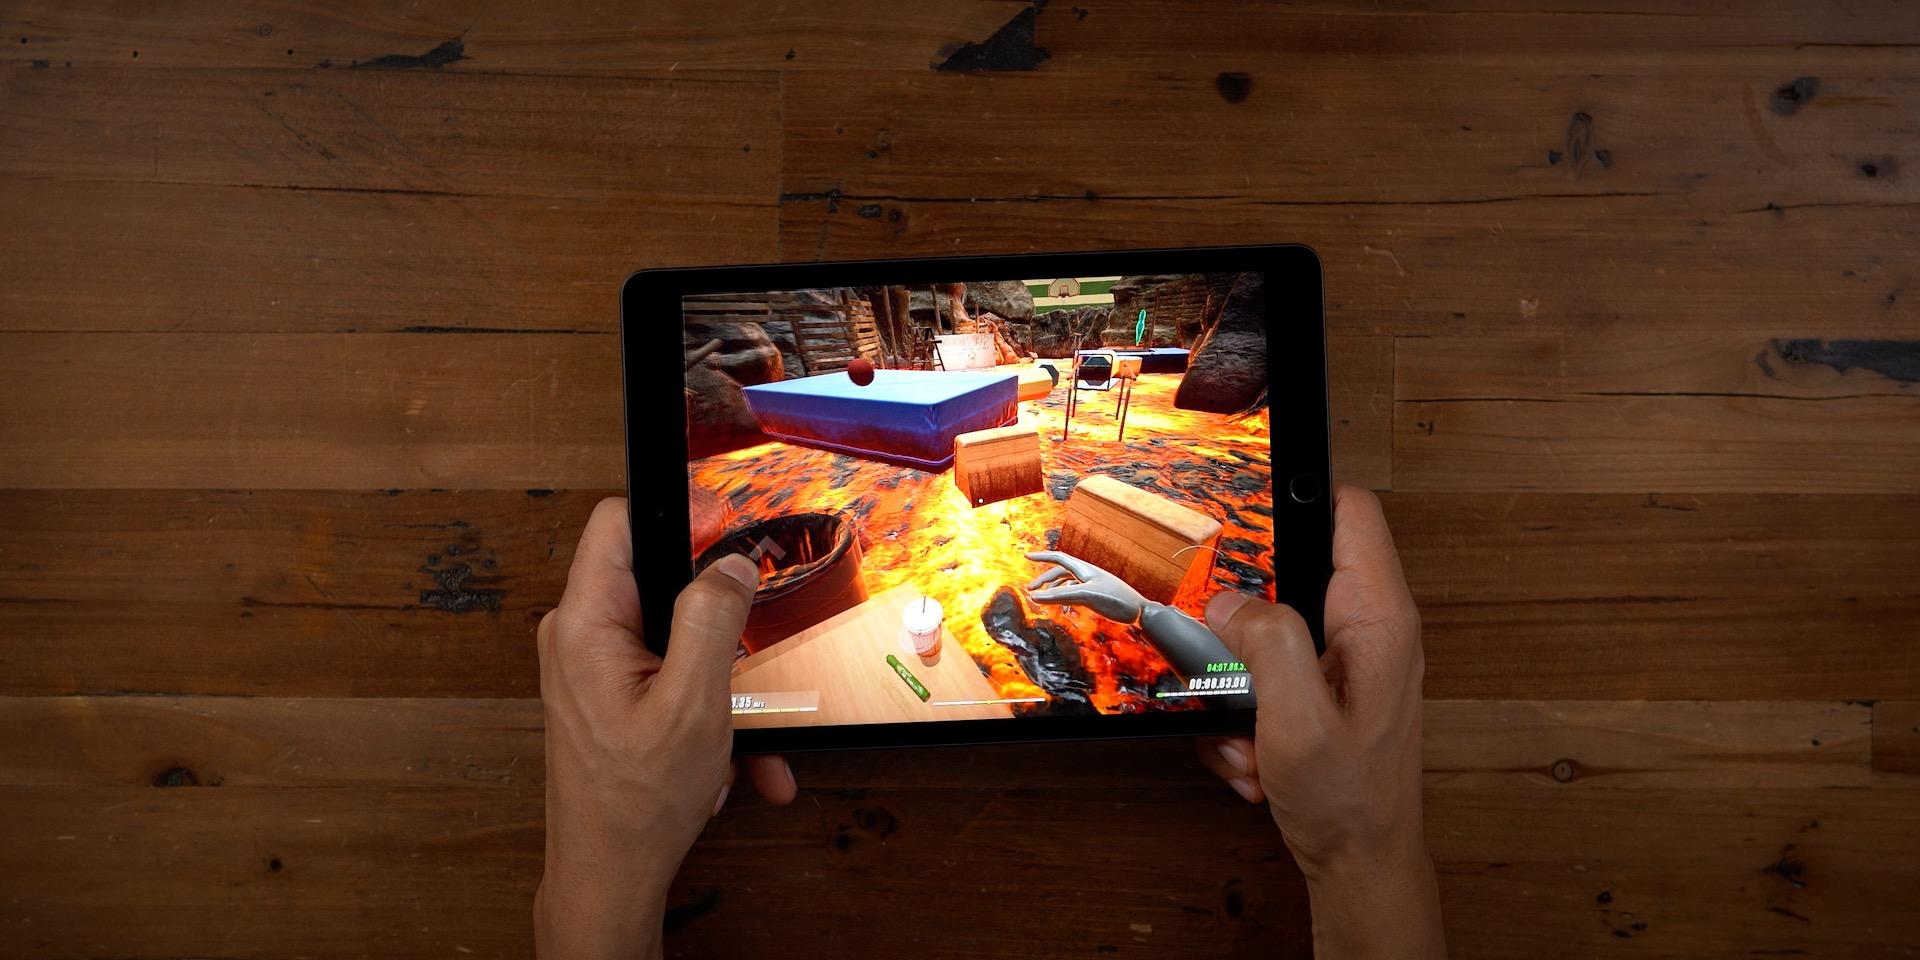 Seventh-gen iPad performance